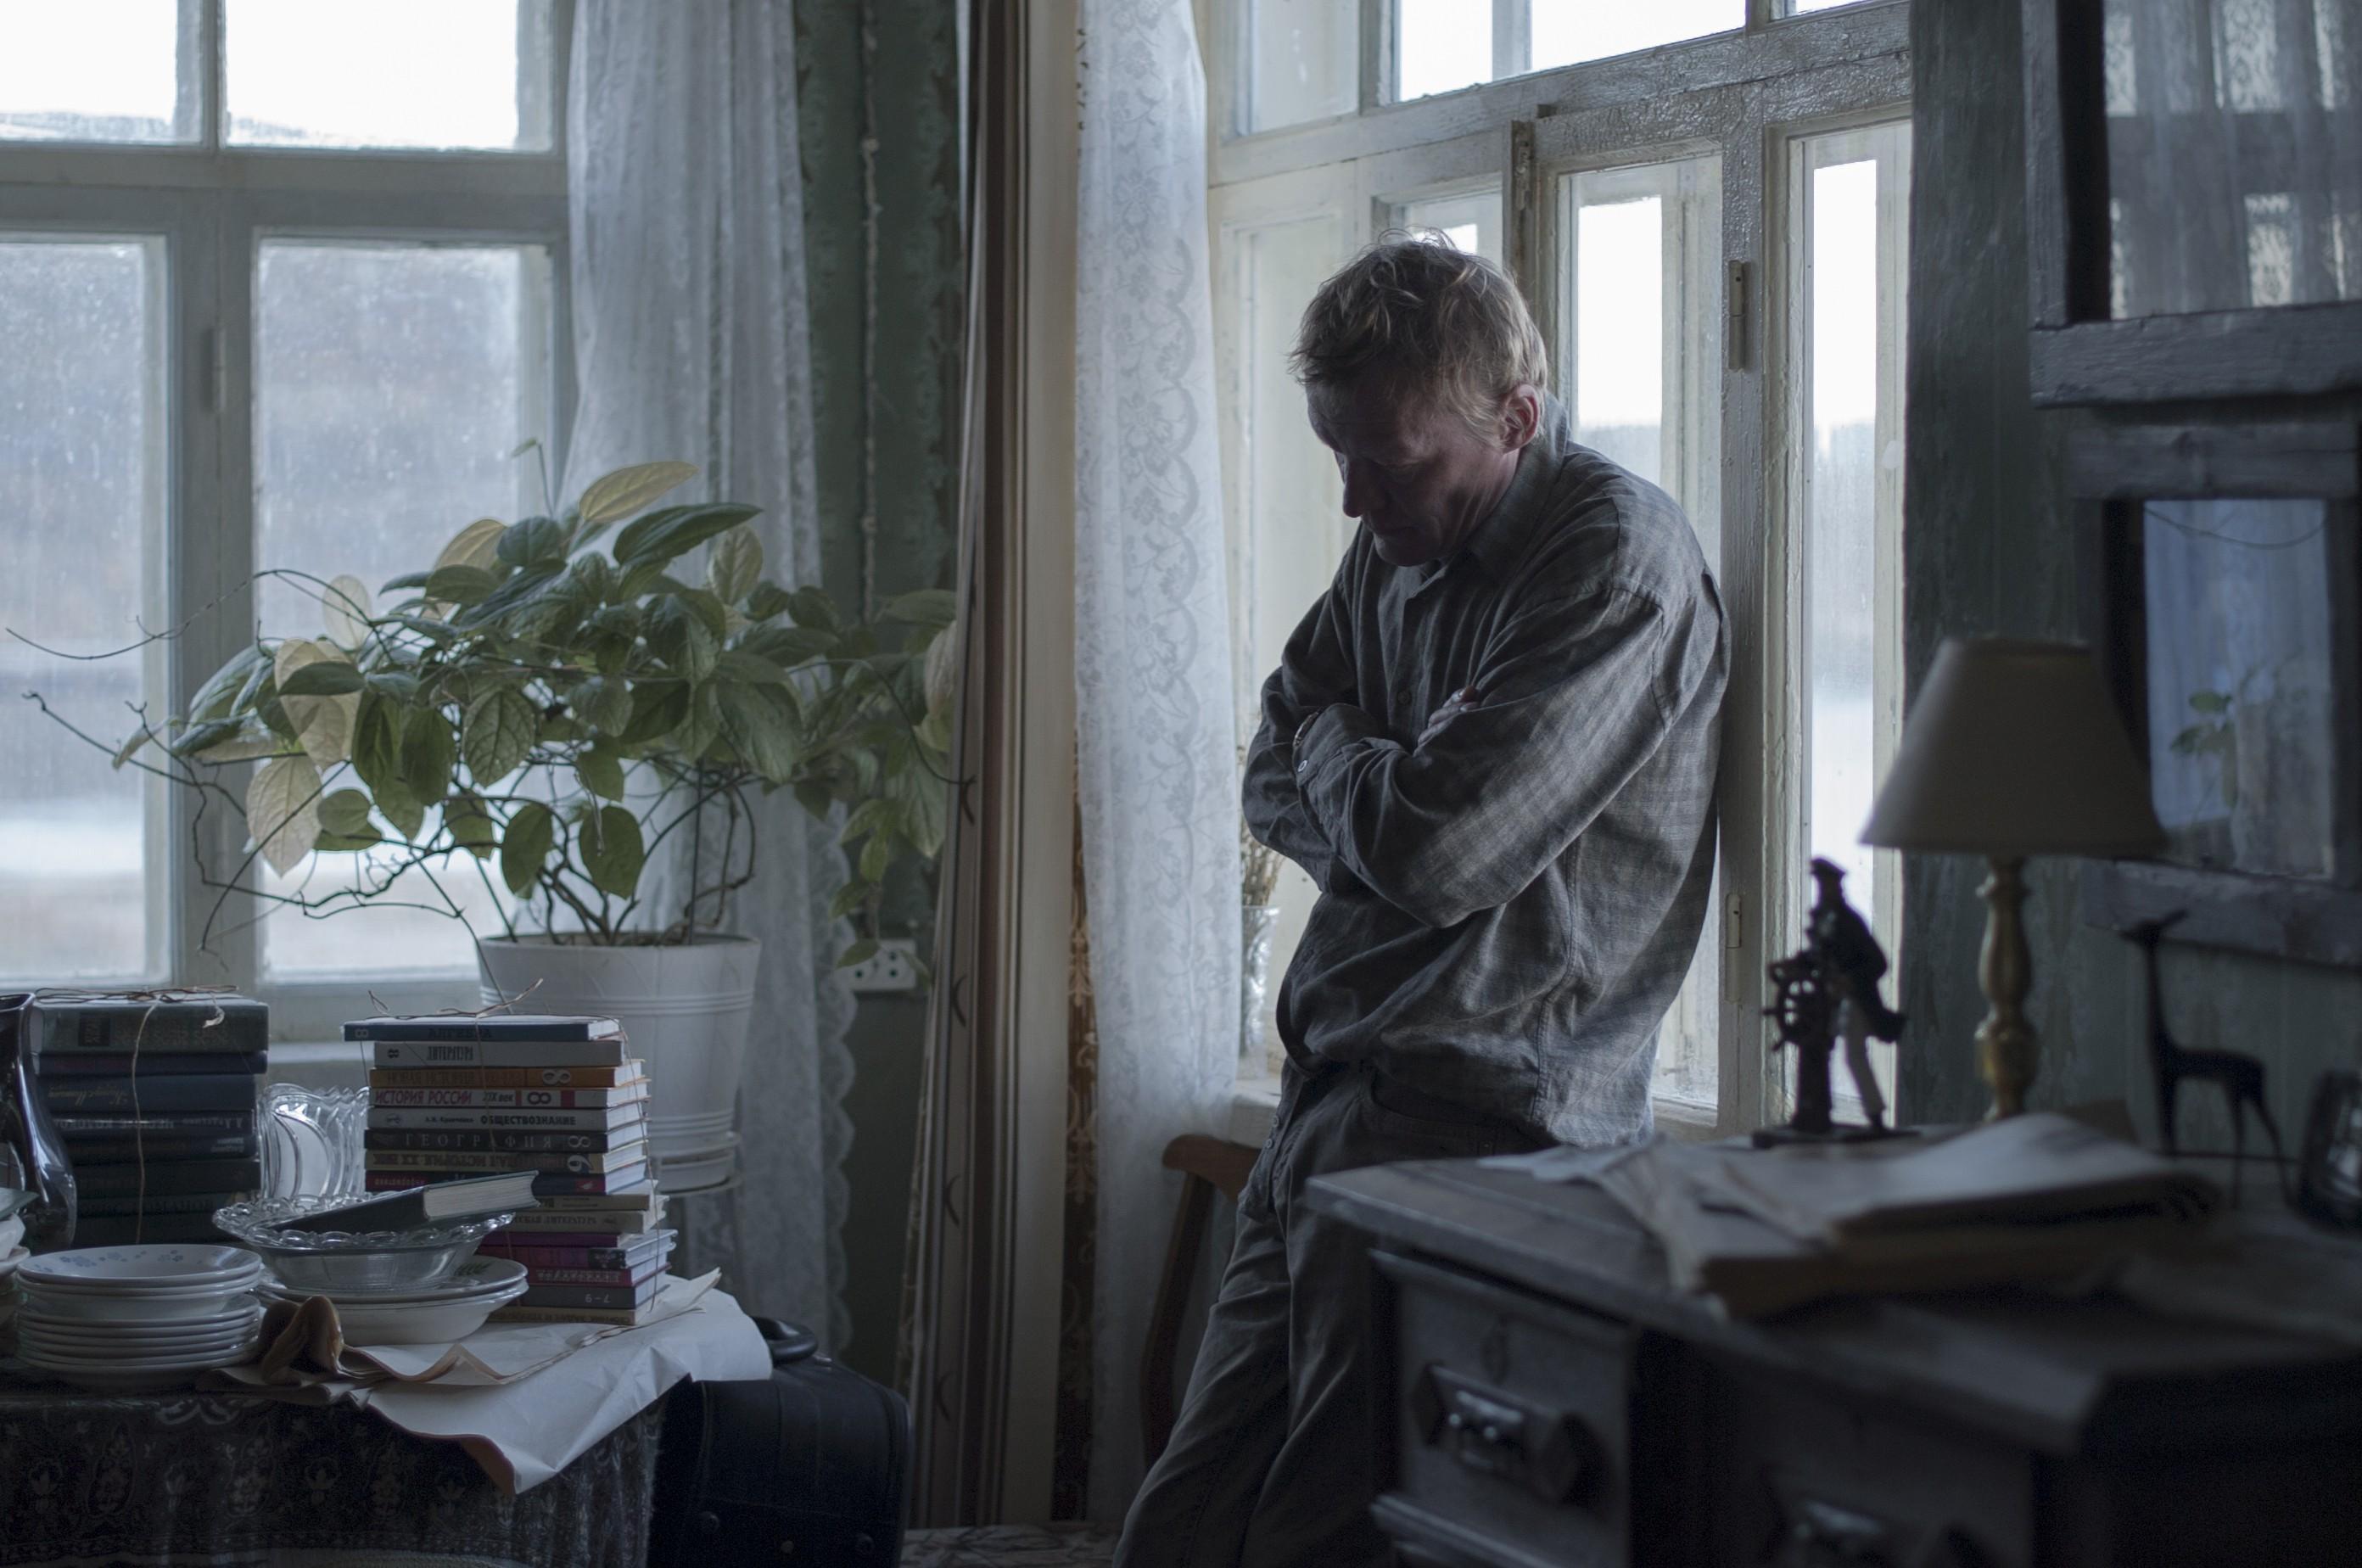 кадры из фильма Левиафан Алексей Серебряков,